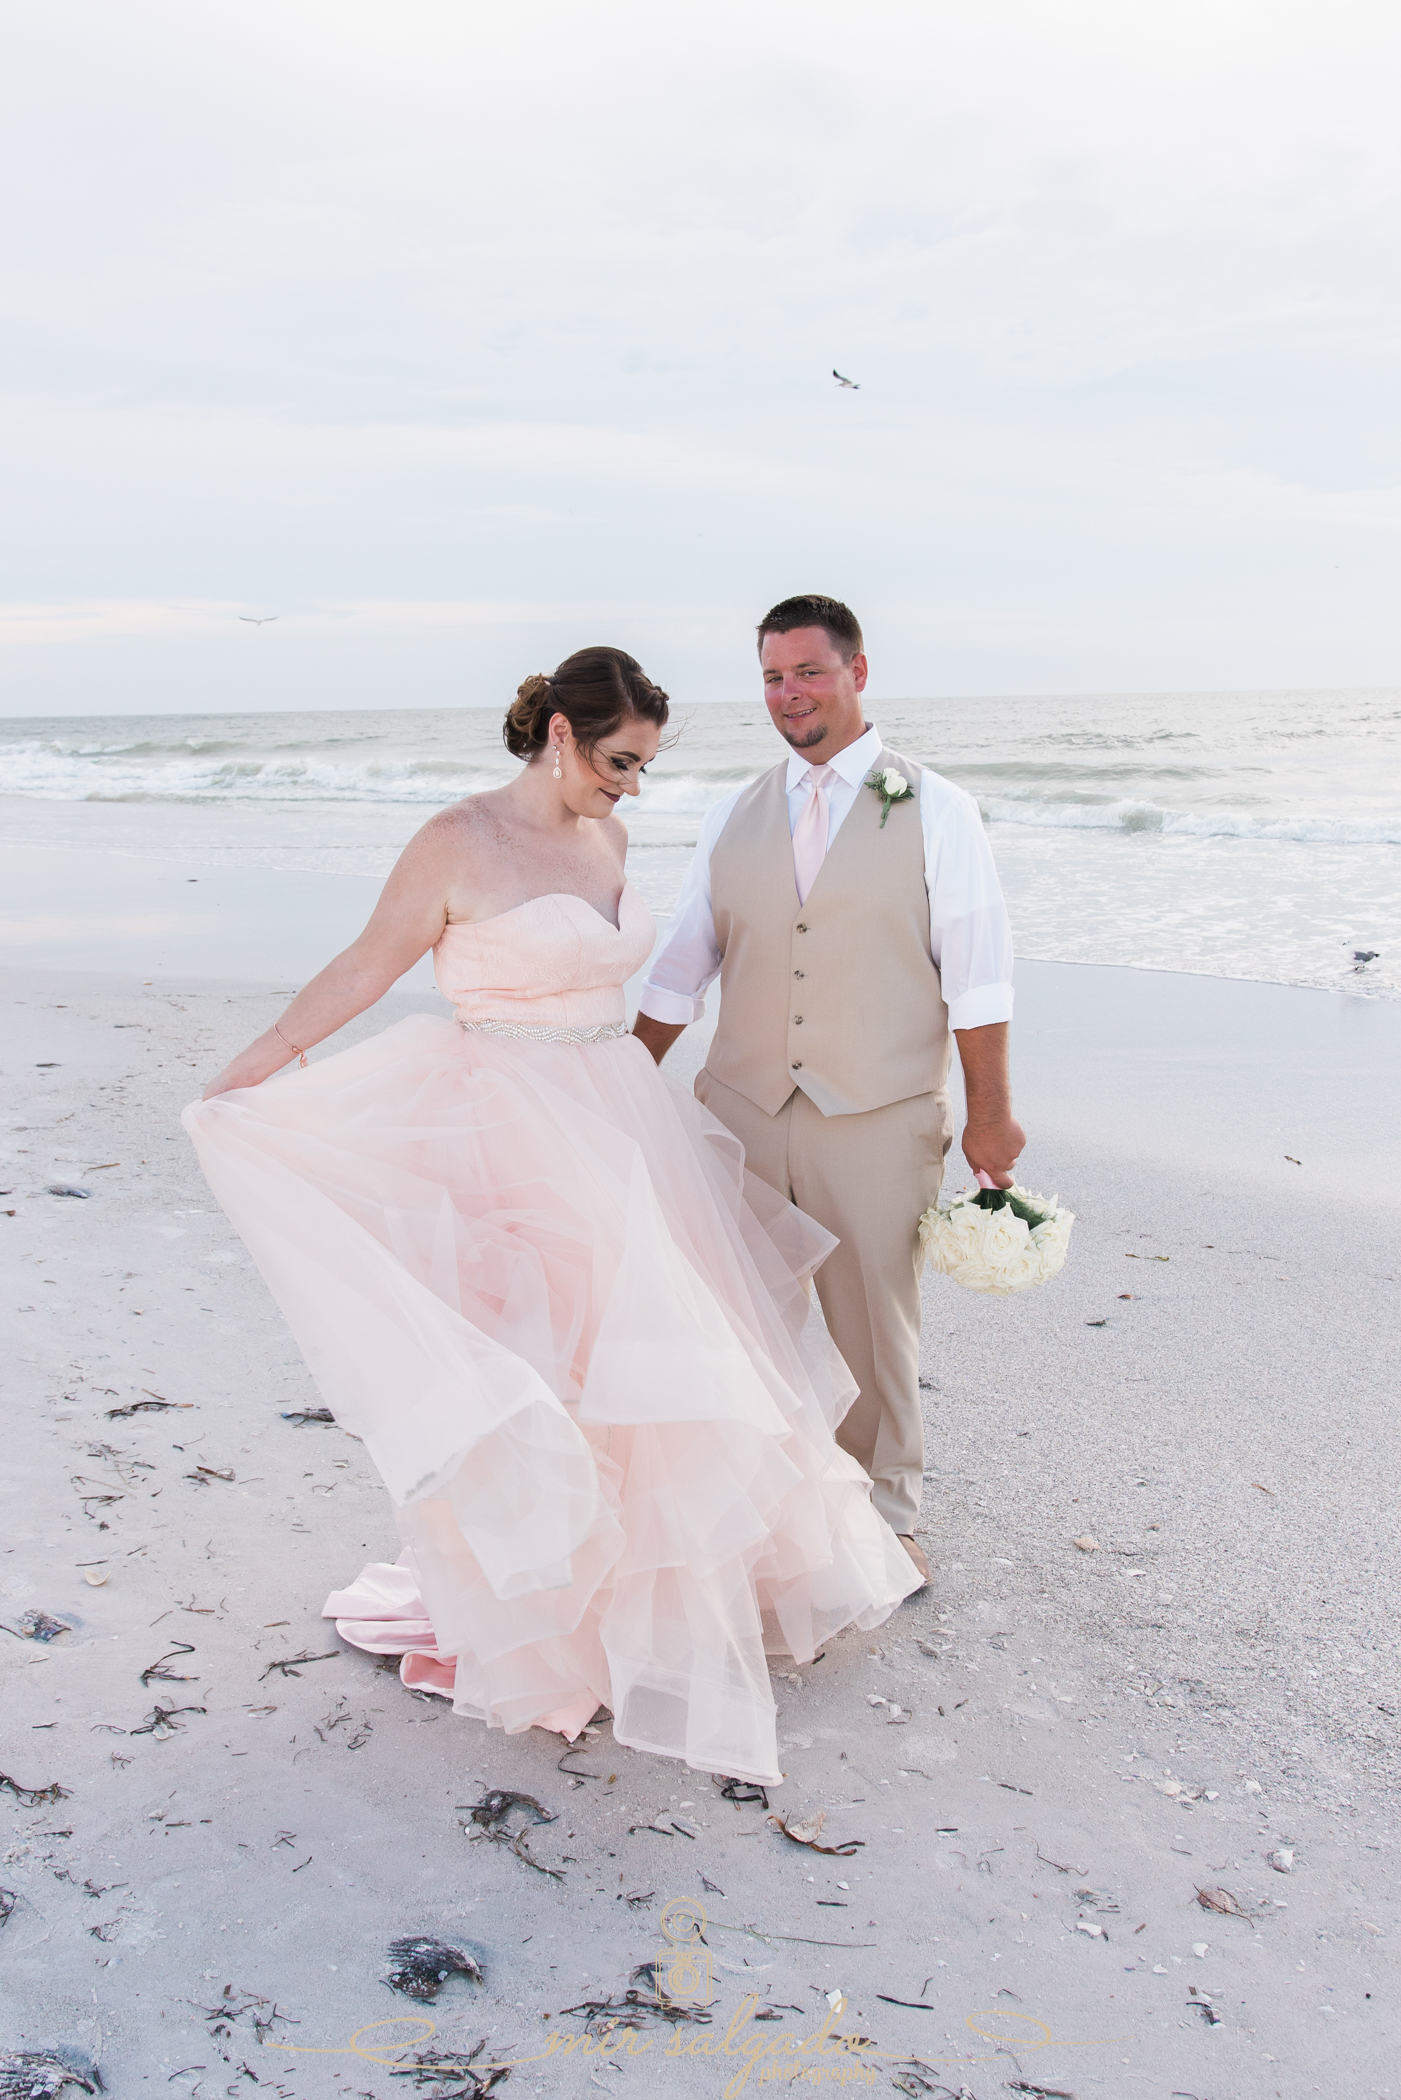 Florida-destination-wedding-photographer, Florida-beach-wedding-photo, pink-wedding-dress